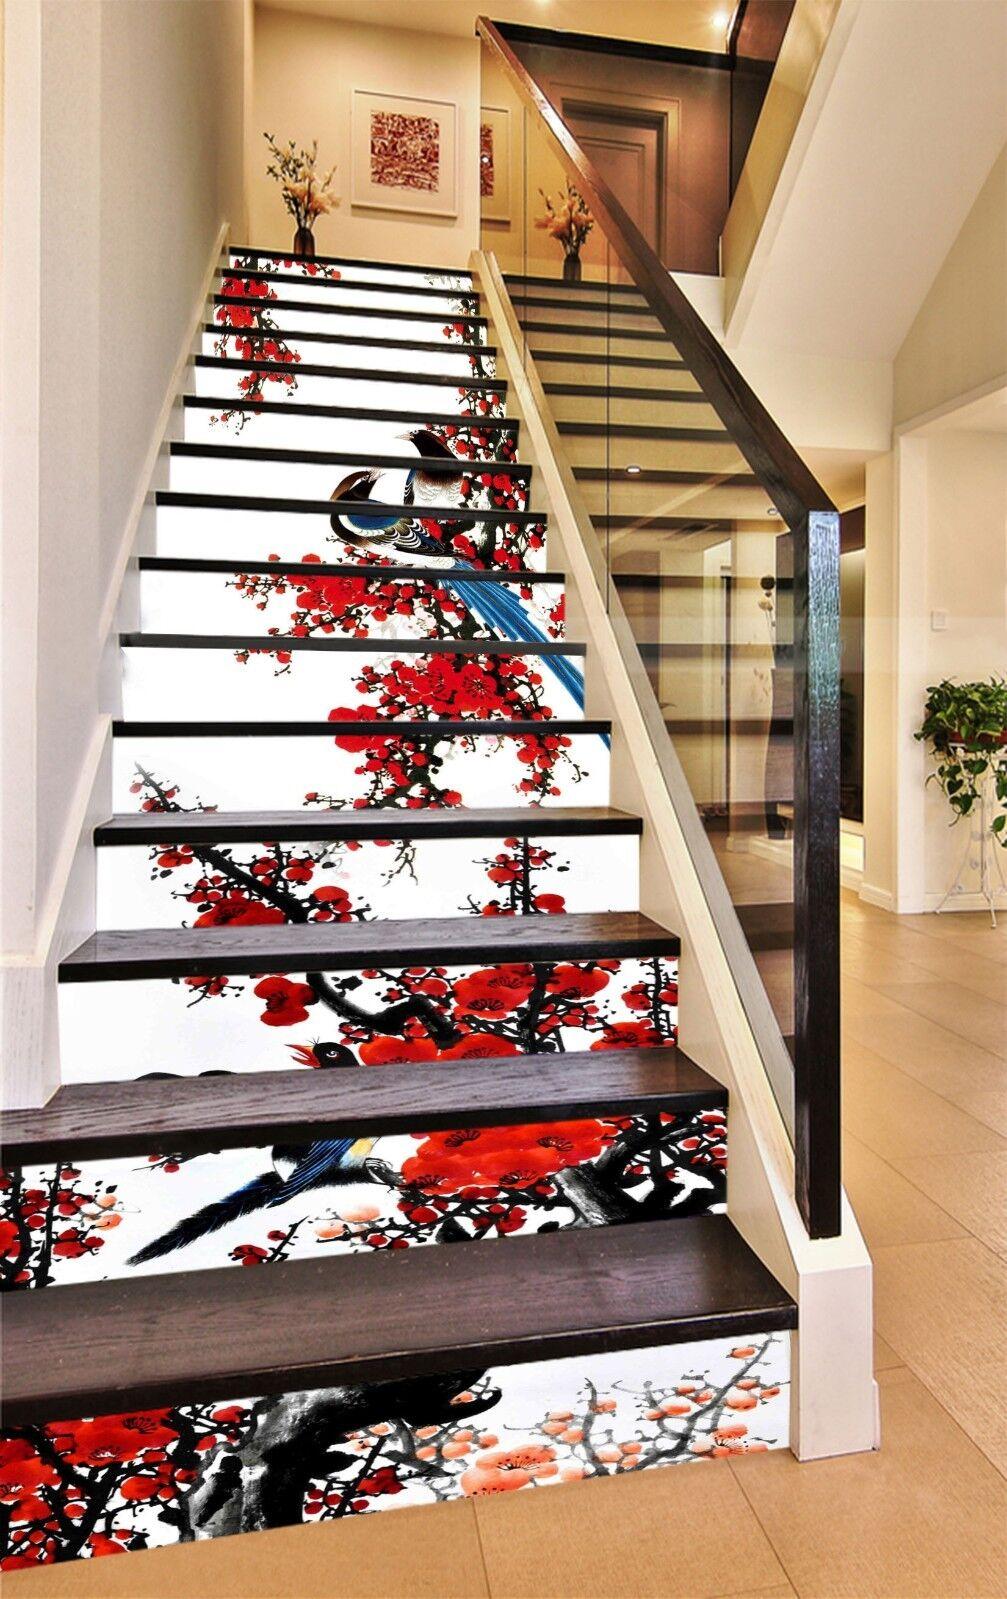 3D Plum bird Stair Risers Decoration Photo Mural Vinyl Decal WandPapier AU